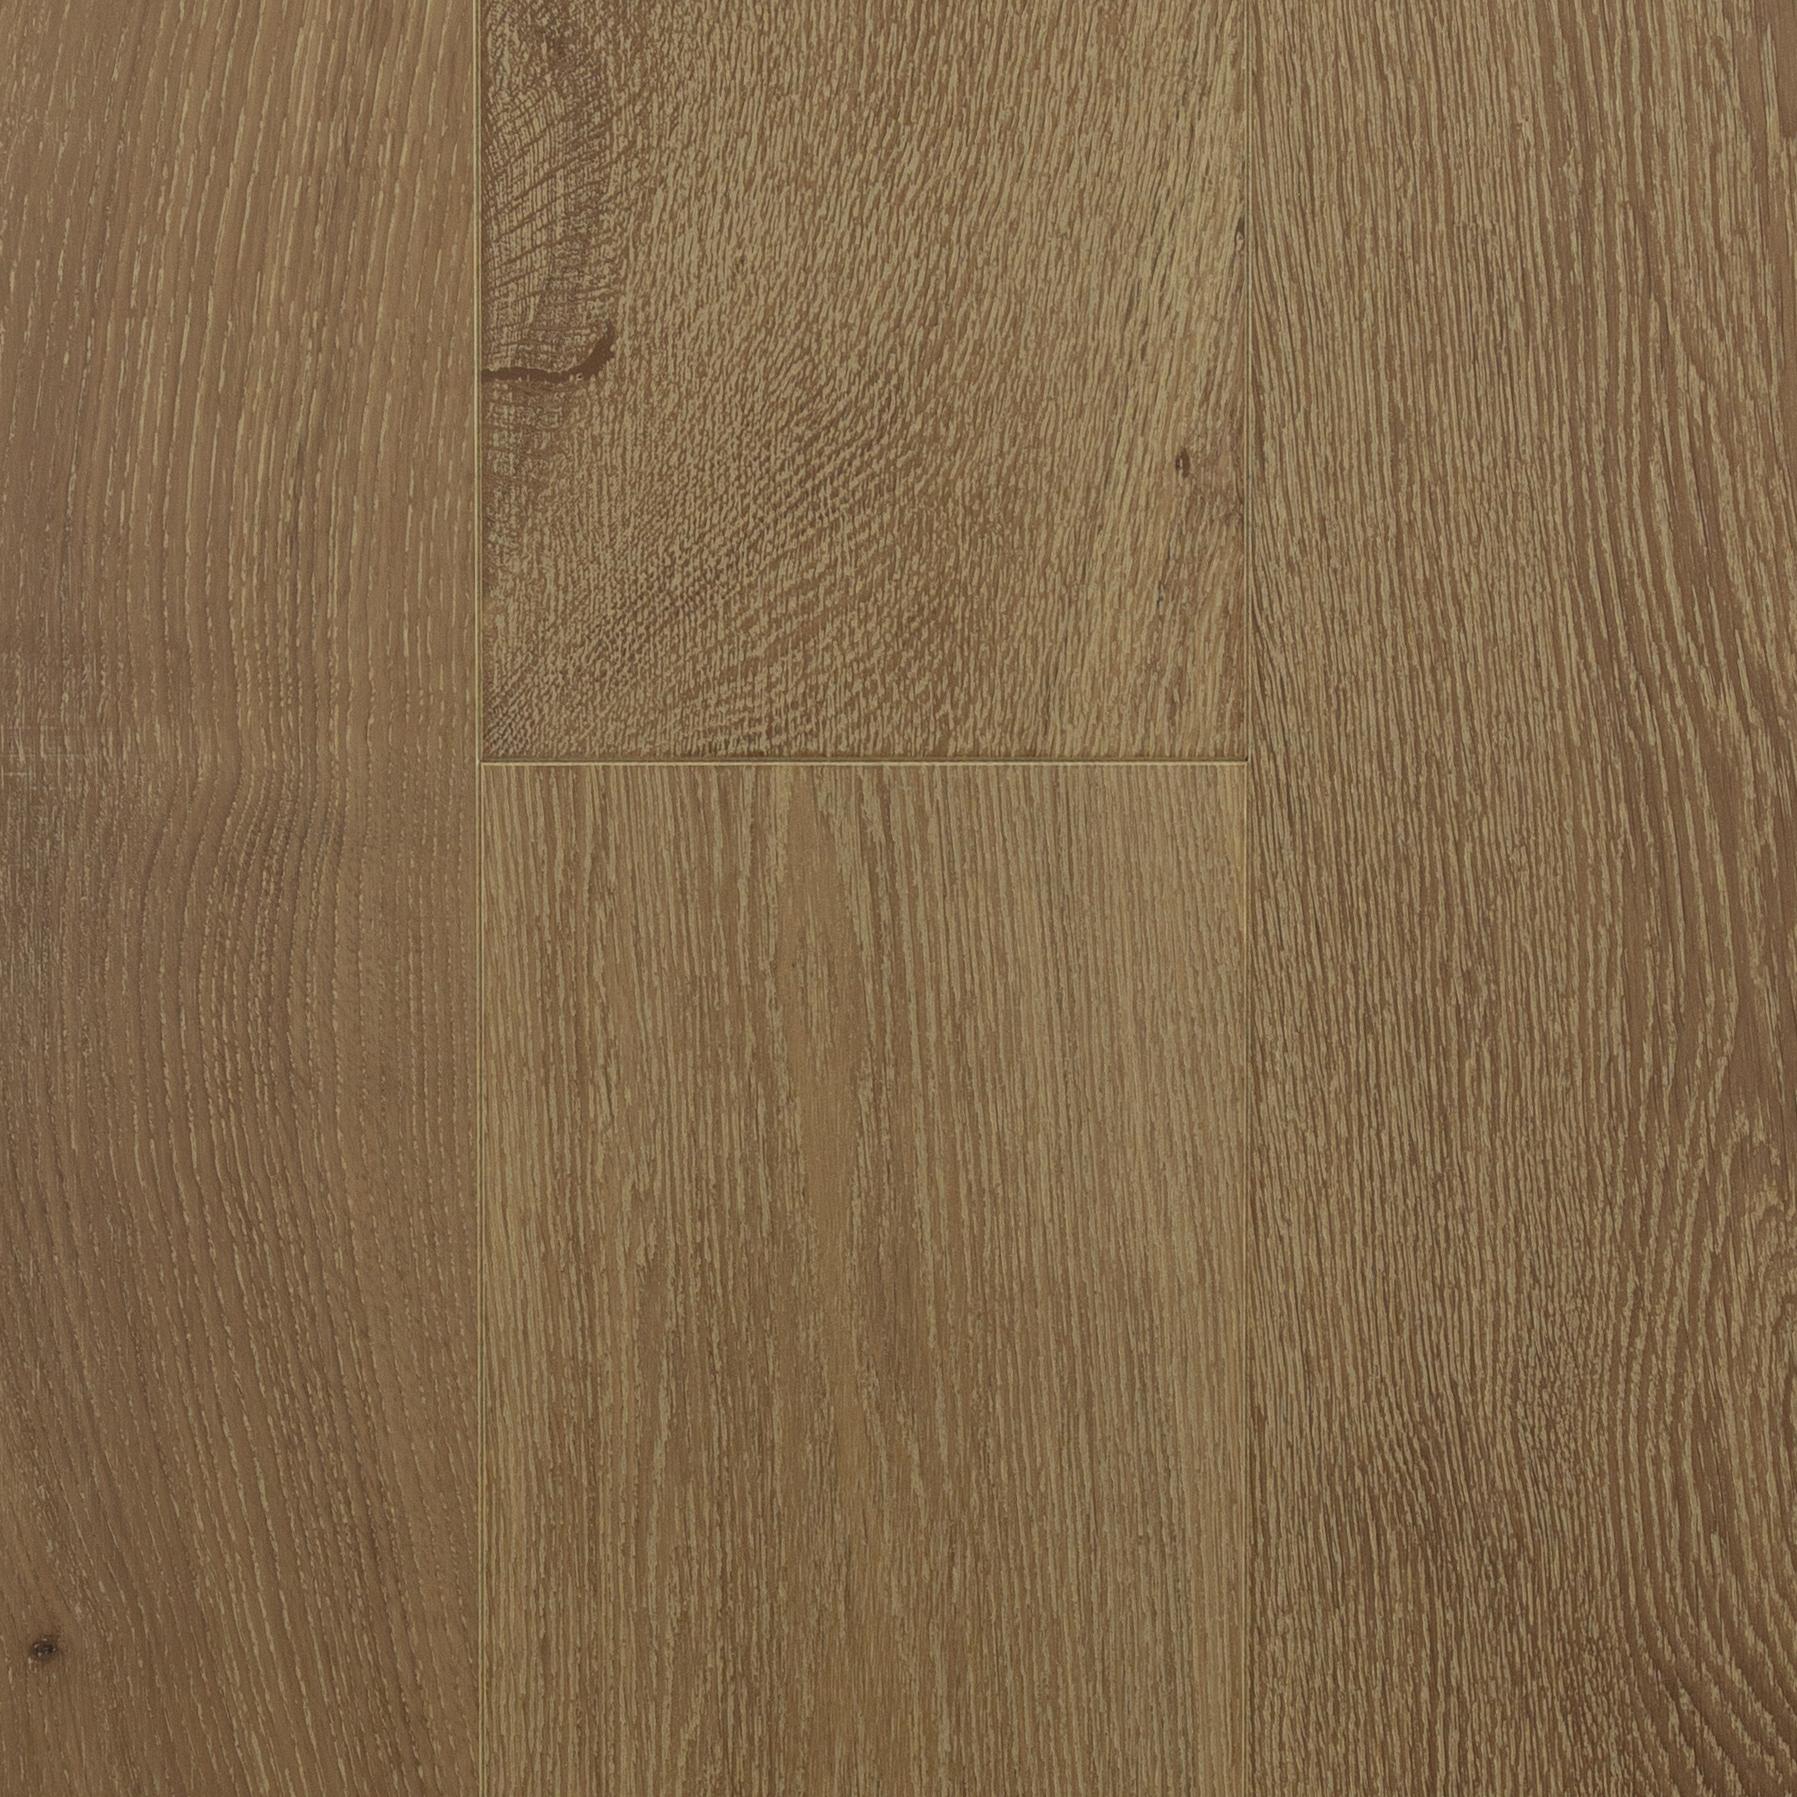 6mm Oak Toscana